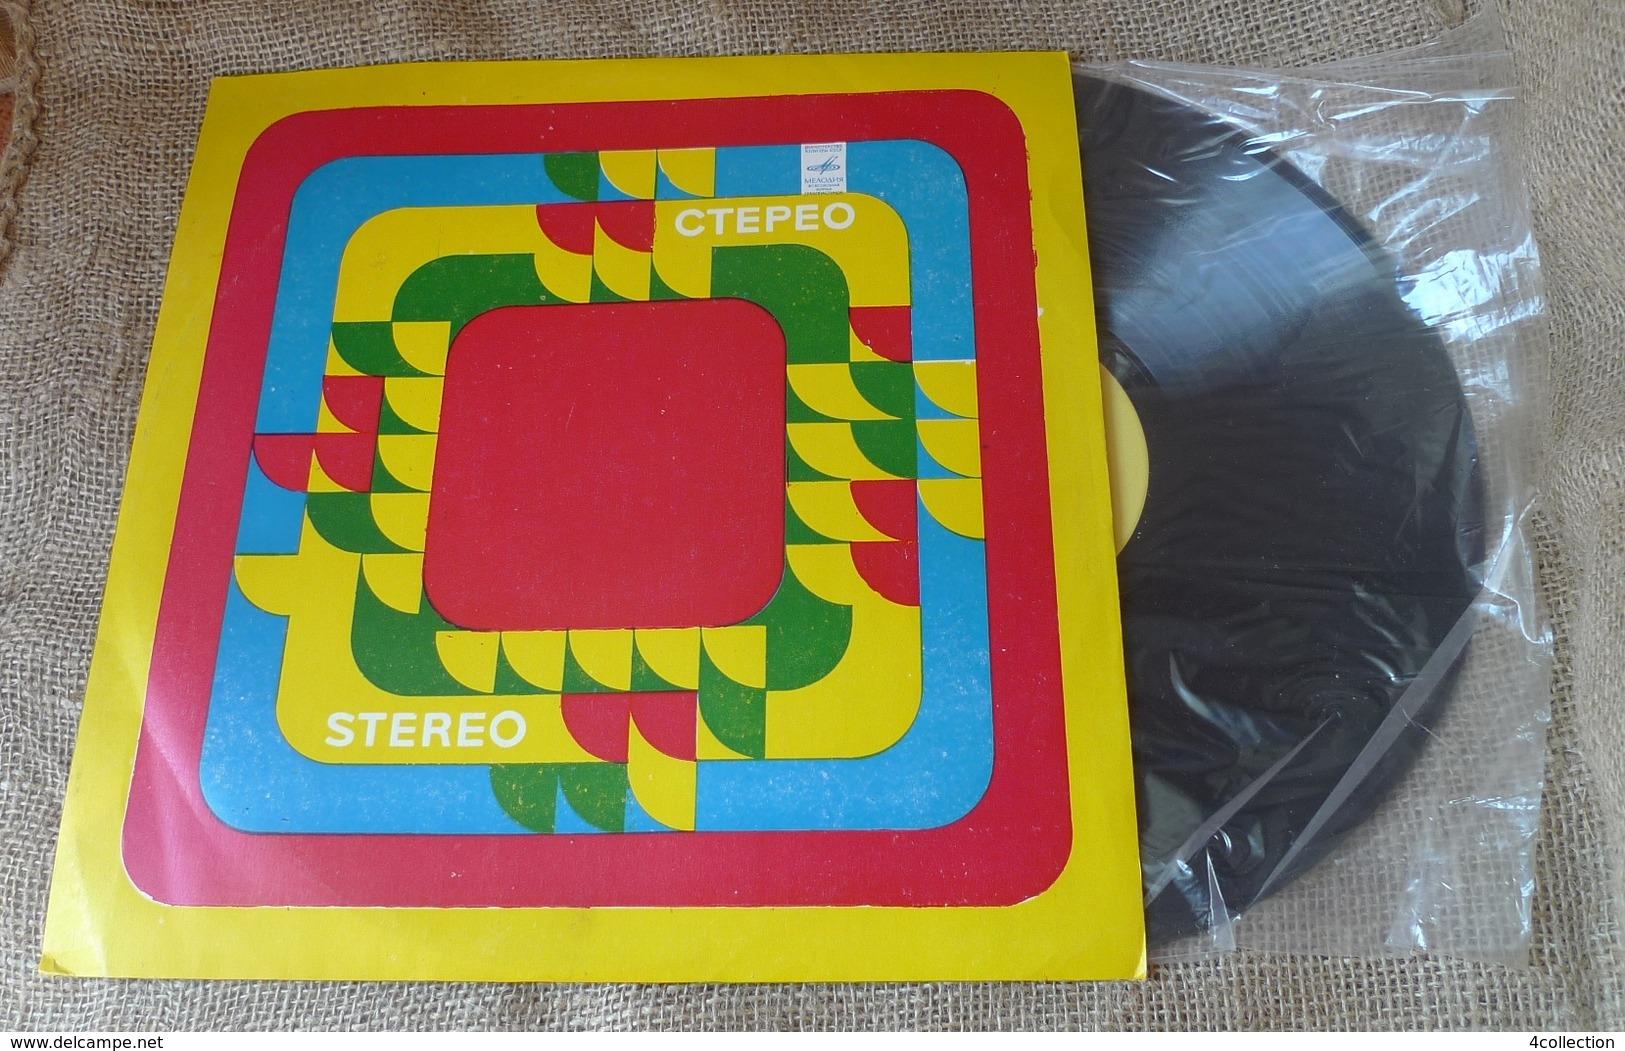 Vinyl Records Stereo 33 Rpm LP Melodies & Rhythm Melodia Melodiya Leningrad - Vinyl Records